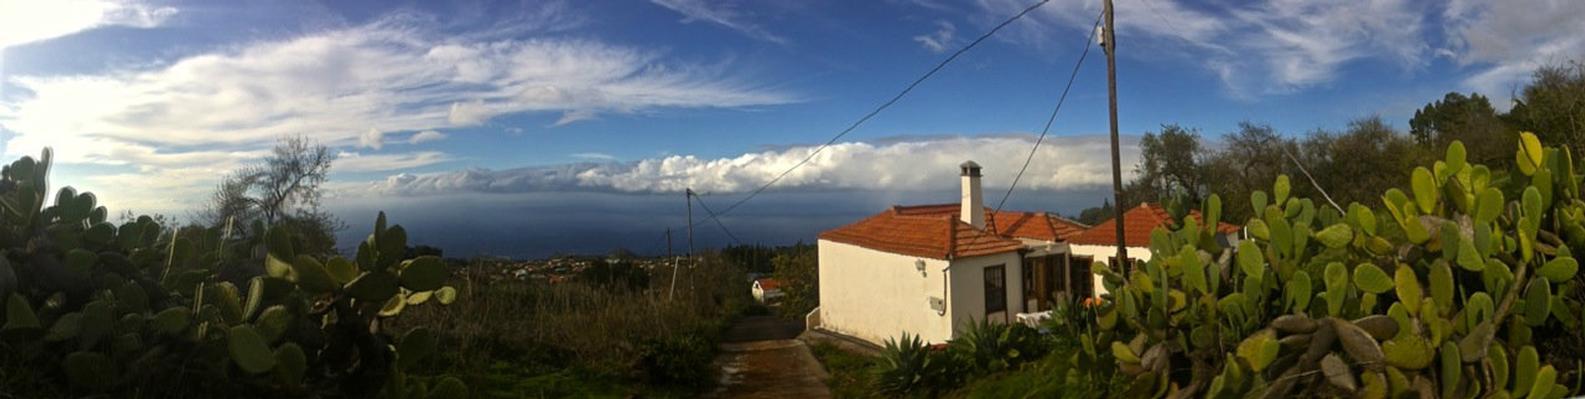 Ferienhaus FINCA TOPO DEL DRAGO (224349), Puntagorda, La Palma, Kanarische Inseln, Spanien, Bild 9